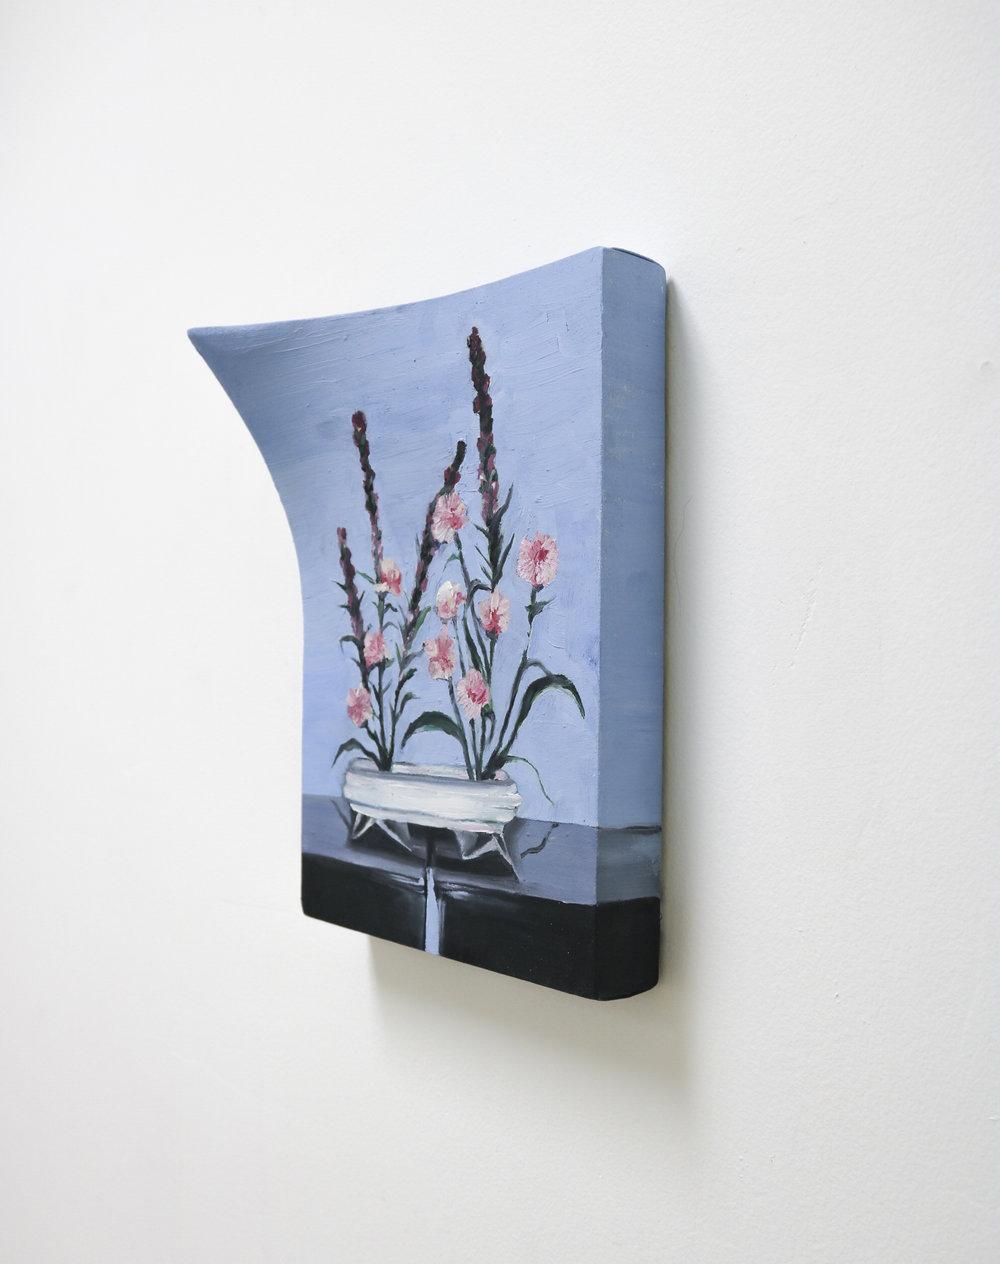 grandma's floral arrangement (bowed)